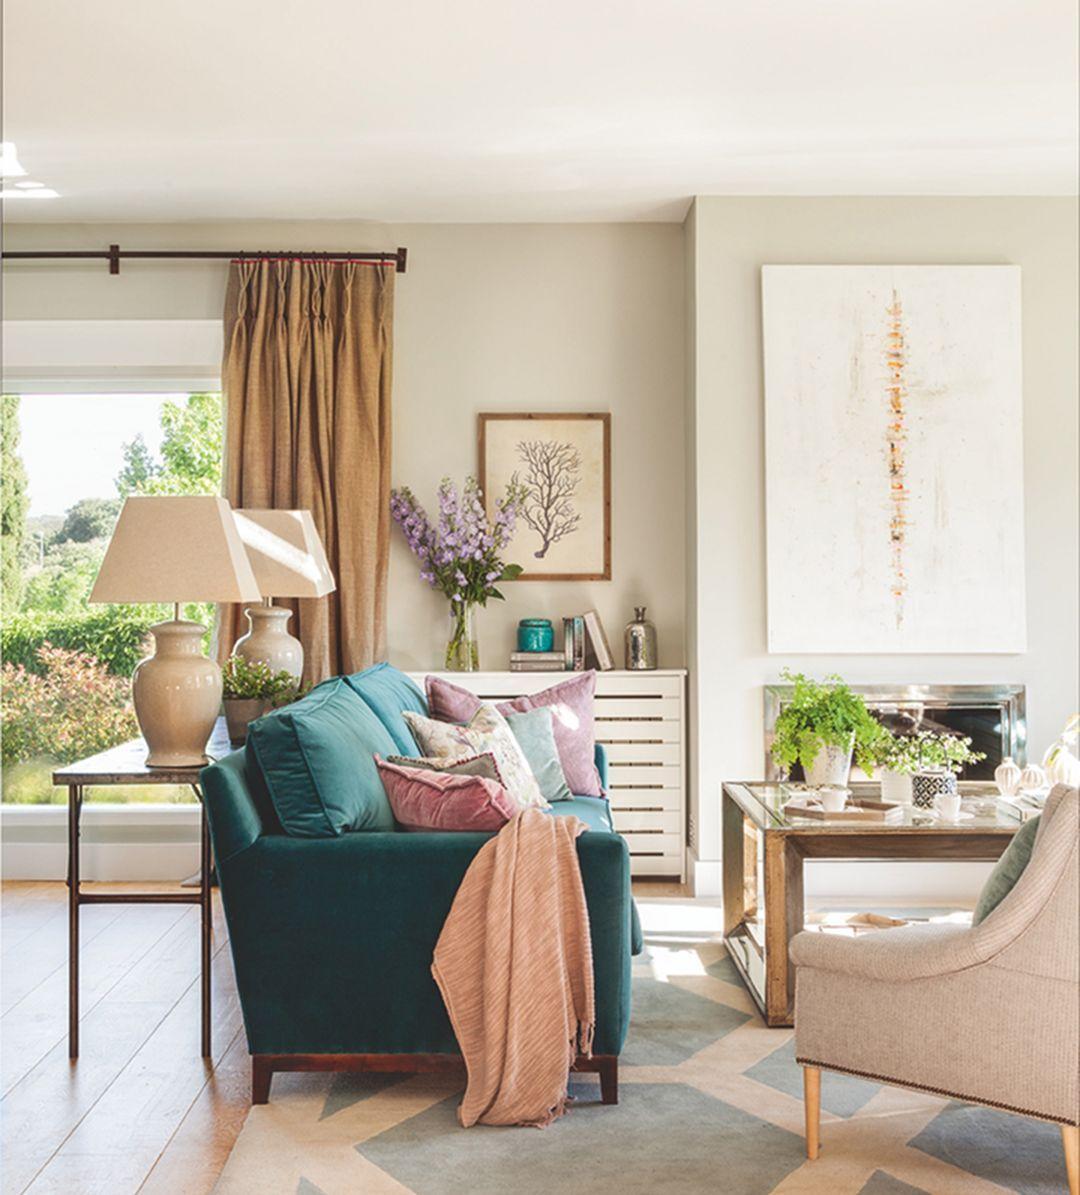 Phenomenon 53 Cozy And Romantic Living Room Ideas On A Budget Beauteous Living Room Ideas On A Budget 2018